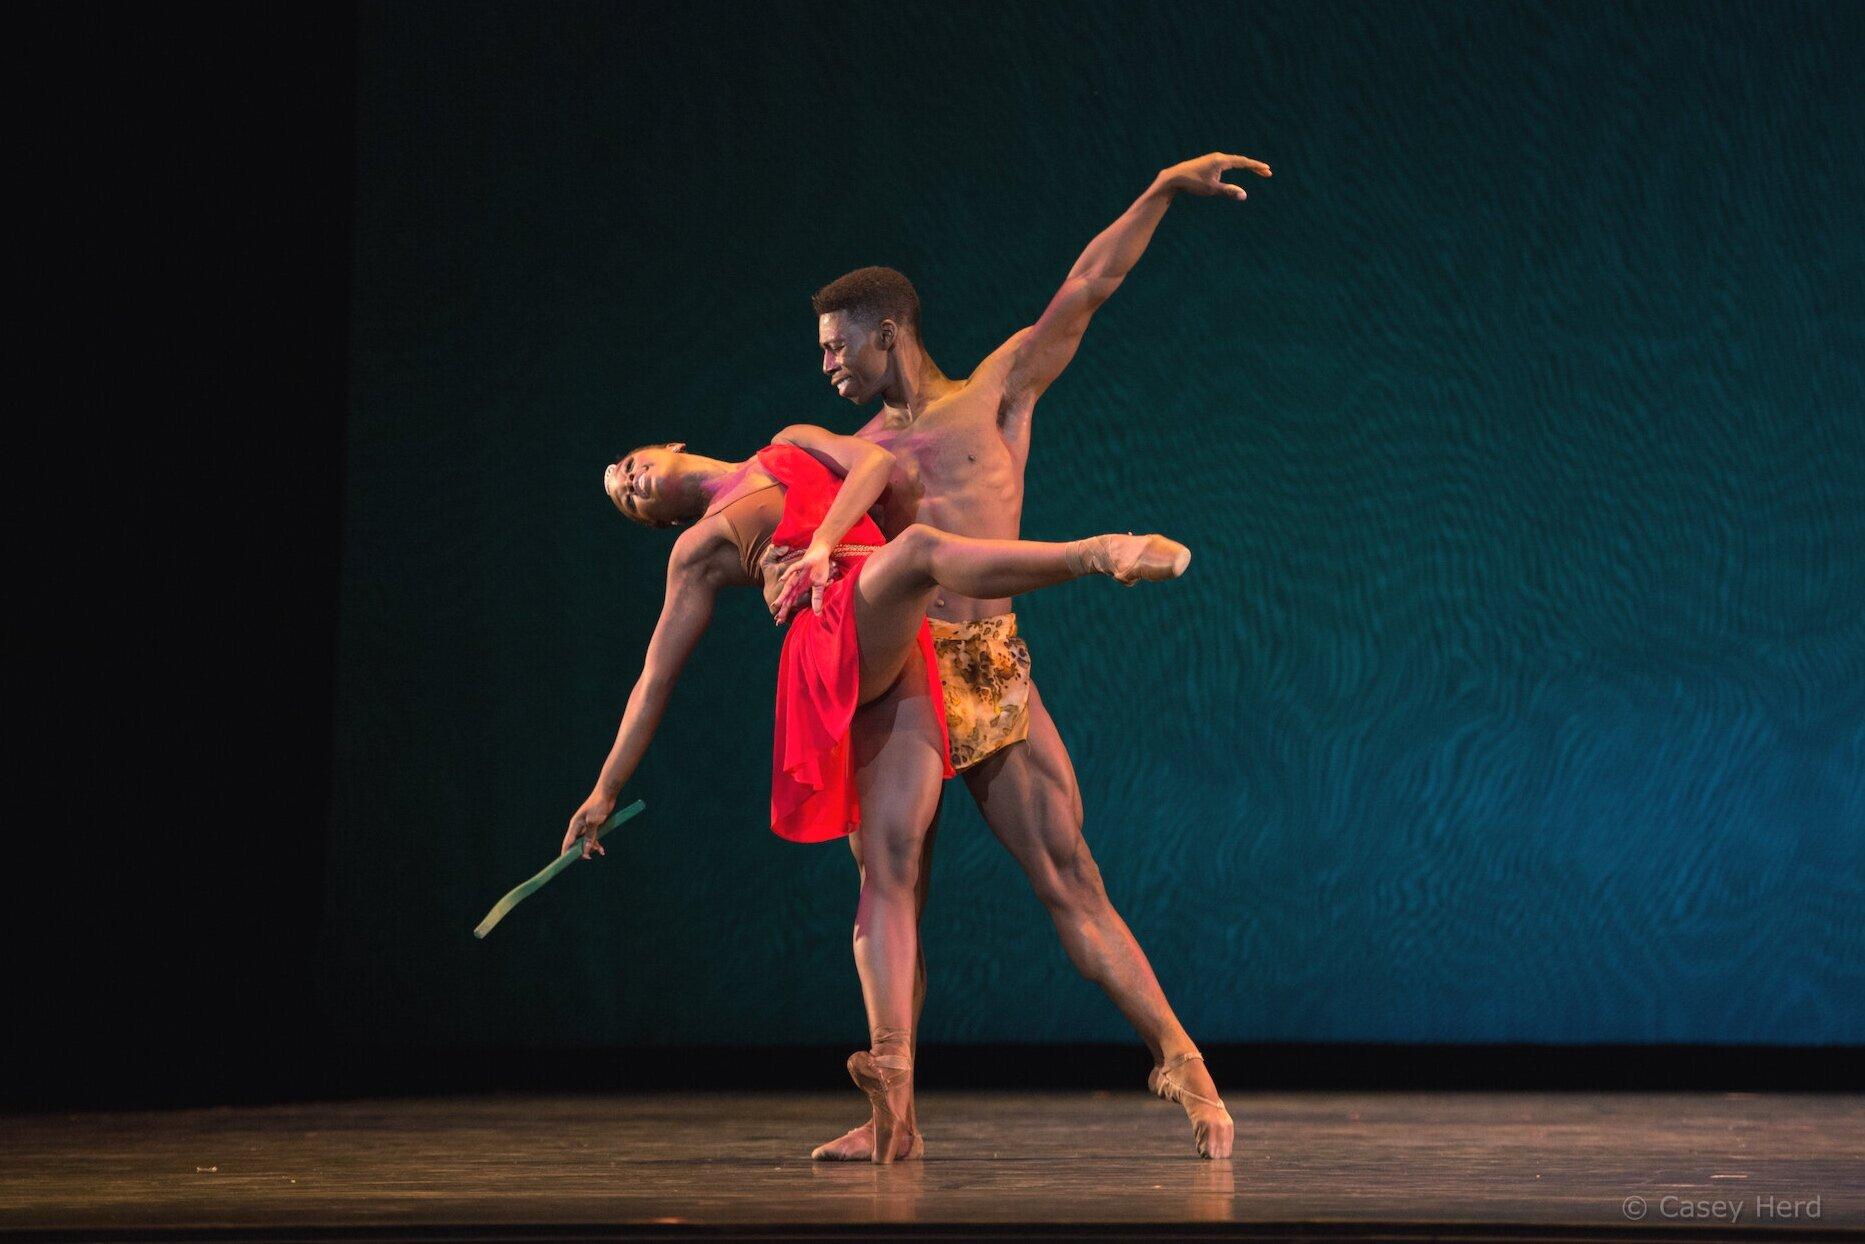 Michaela DePrince and Brooklyn Mack at Despertares Ballet Gala in Guadalajara, Mexico 2016